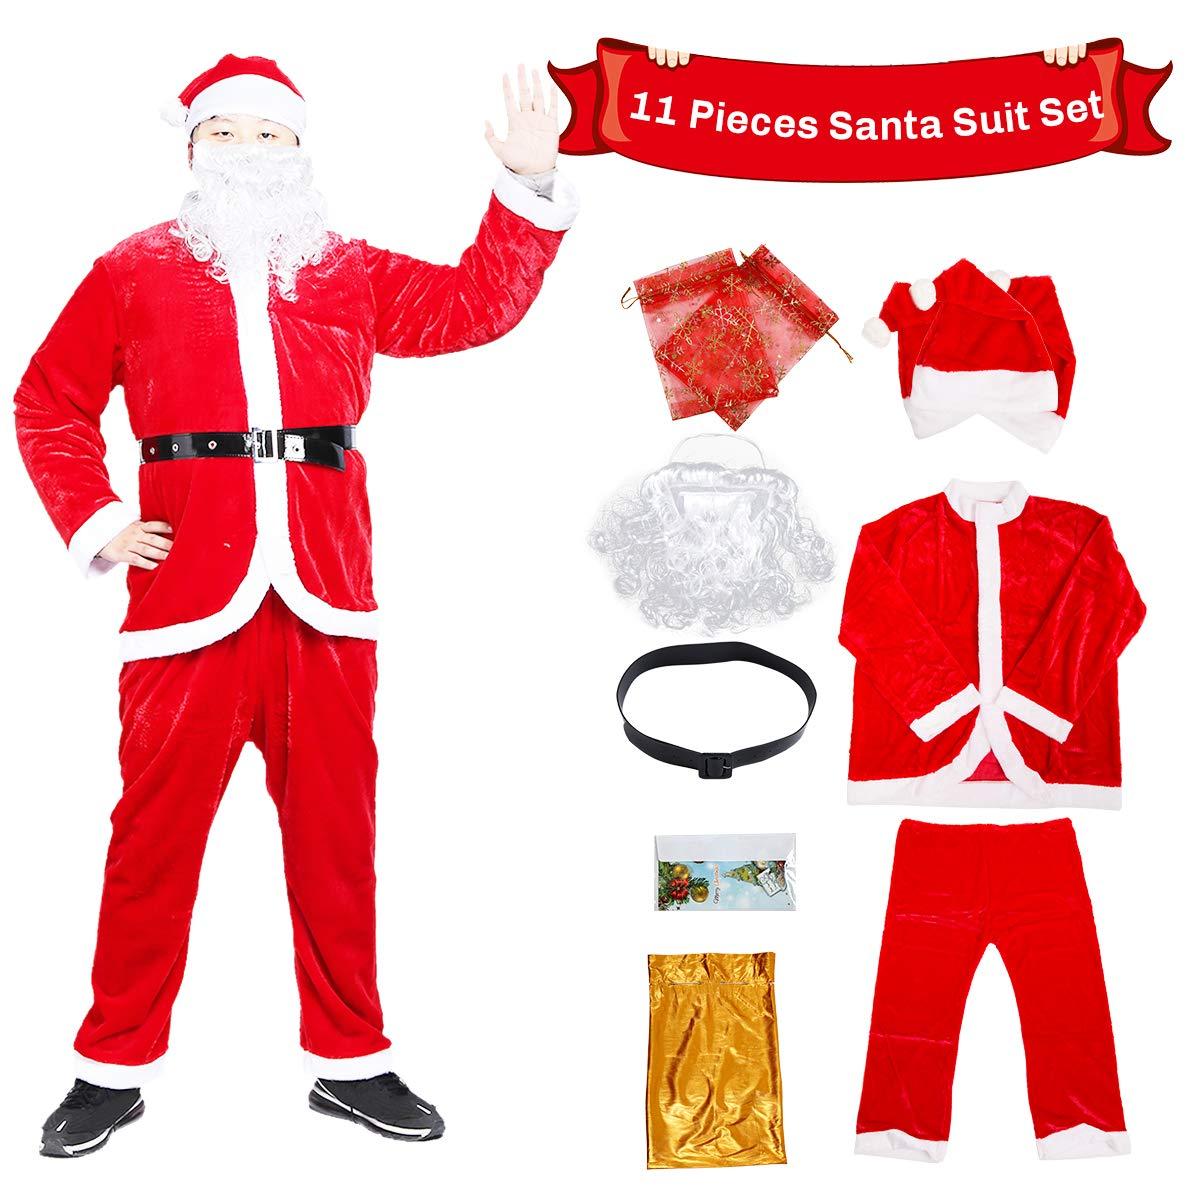 Santa Claus Costume Christmas Santa Suit Plush Santa Costume for Men Adult